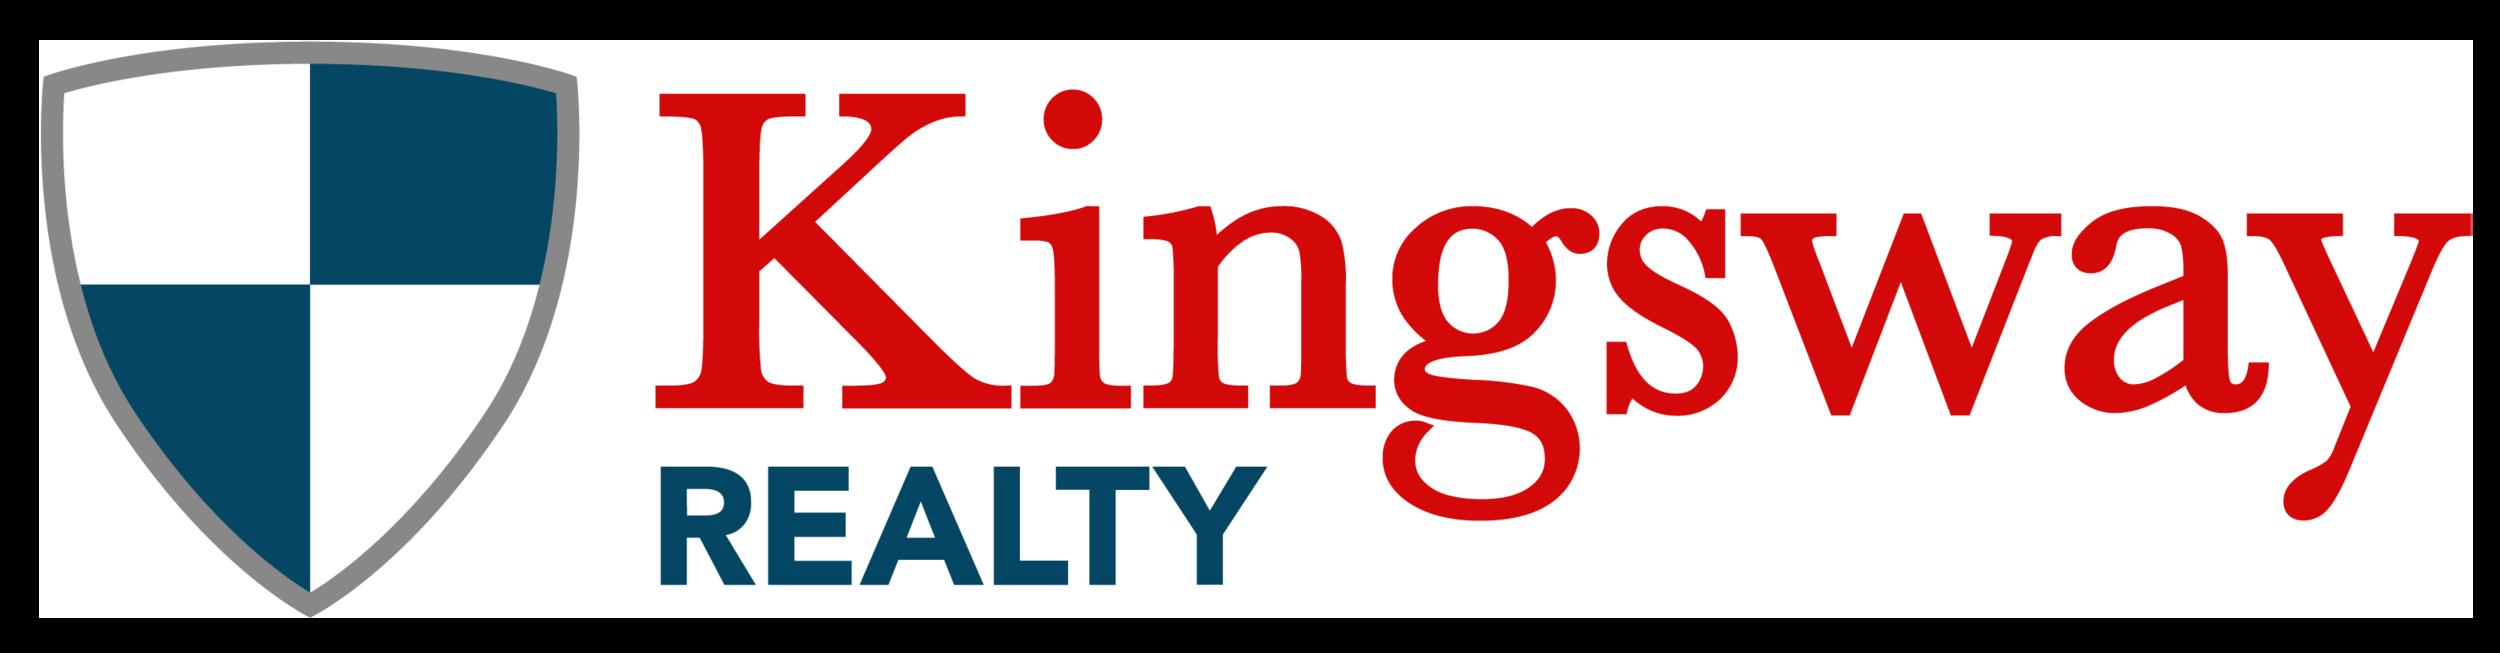 kingsway-logo-5 (2)-01.png